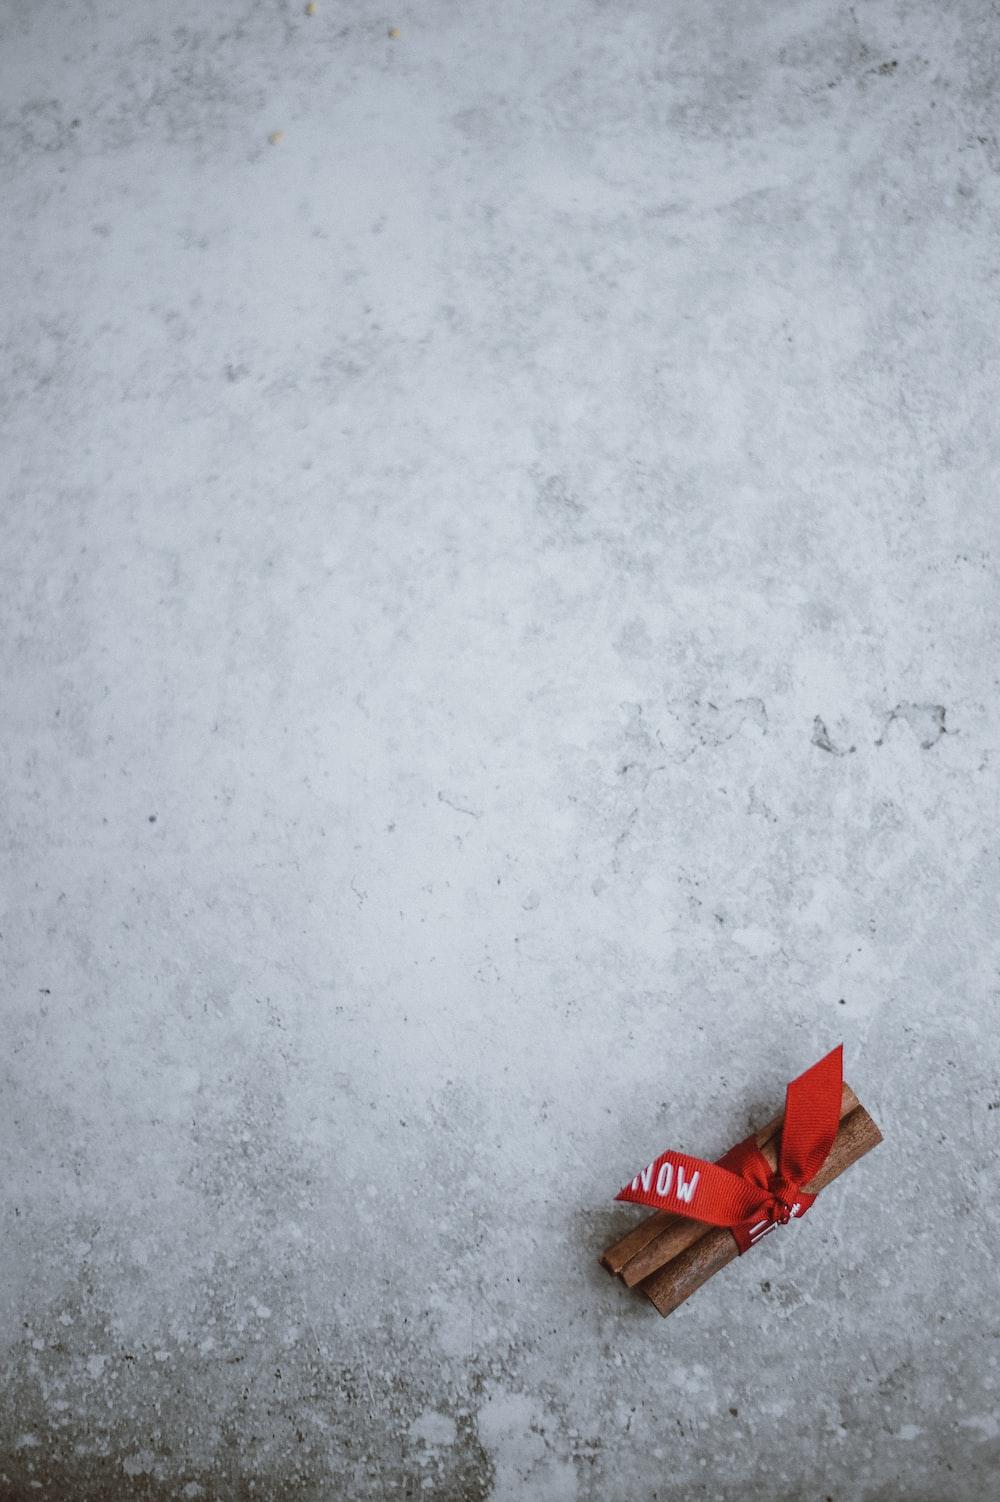 red ribon on snow